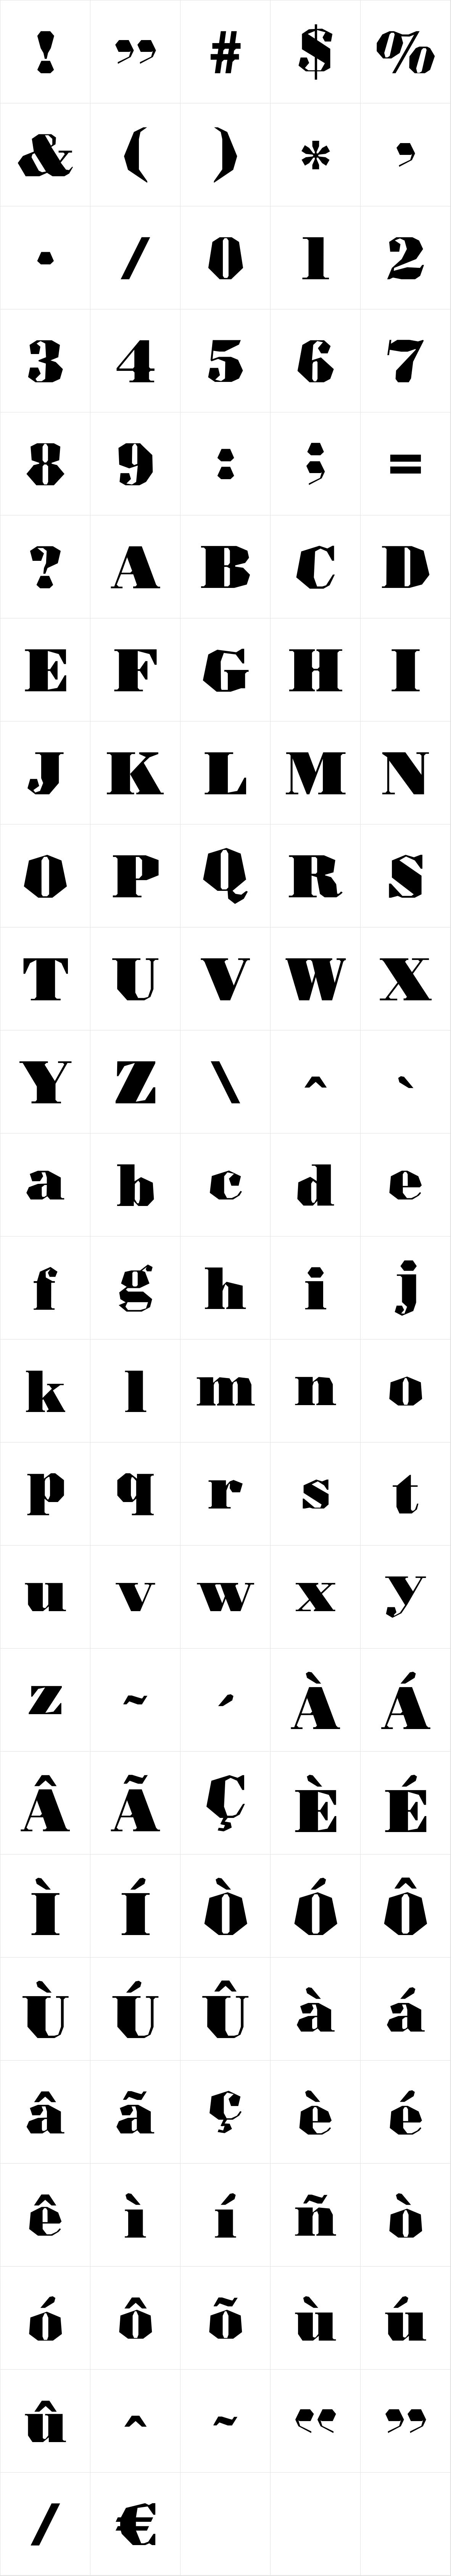 Ladoni Poster